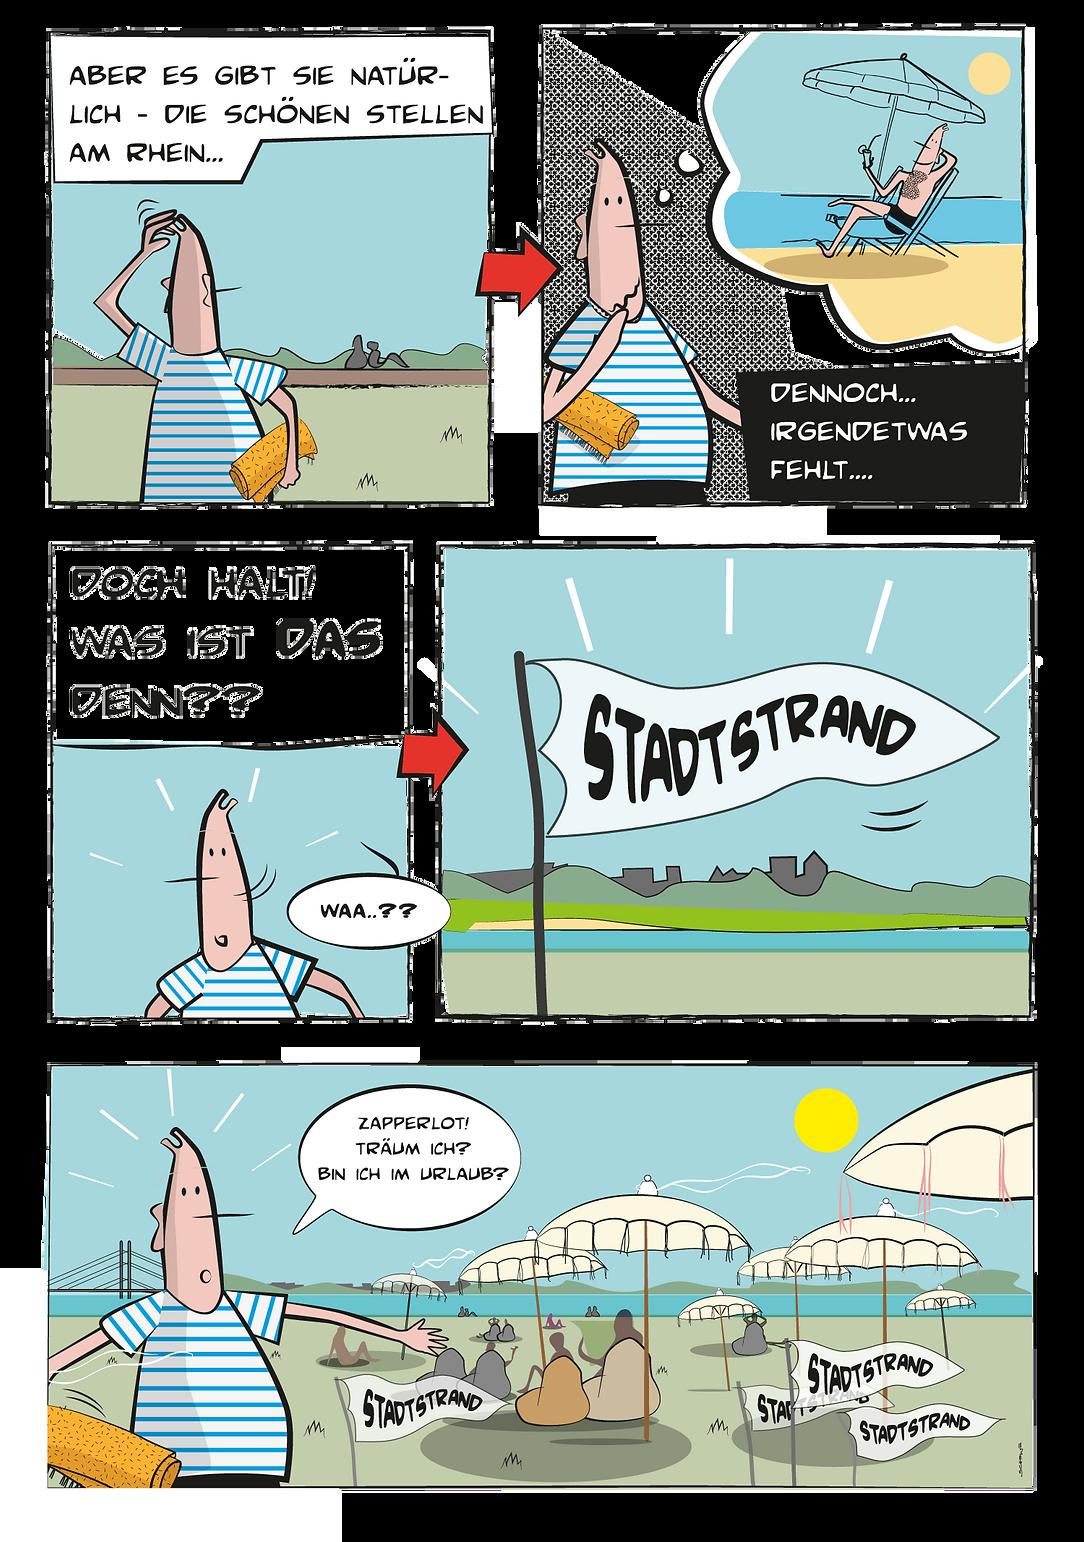 STADTSTRAND_COMIC_web-s4low.png